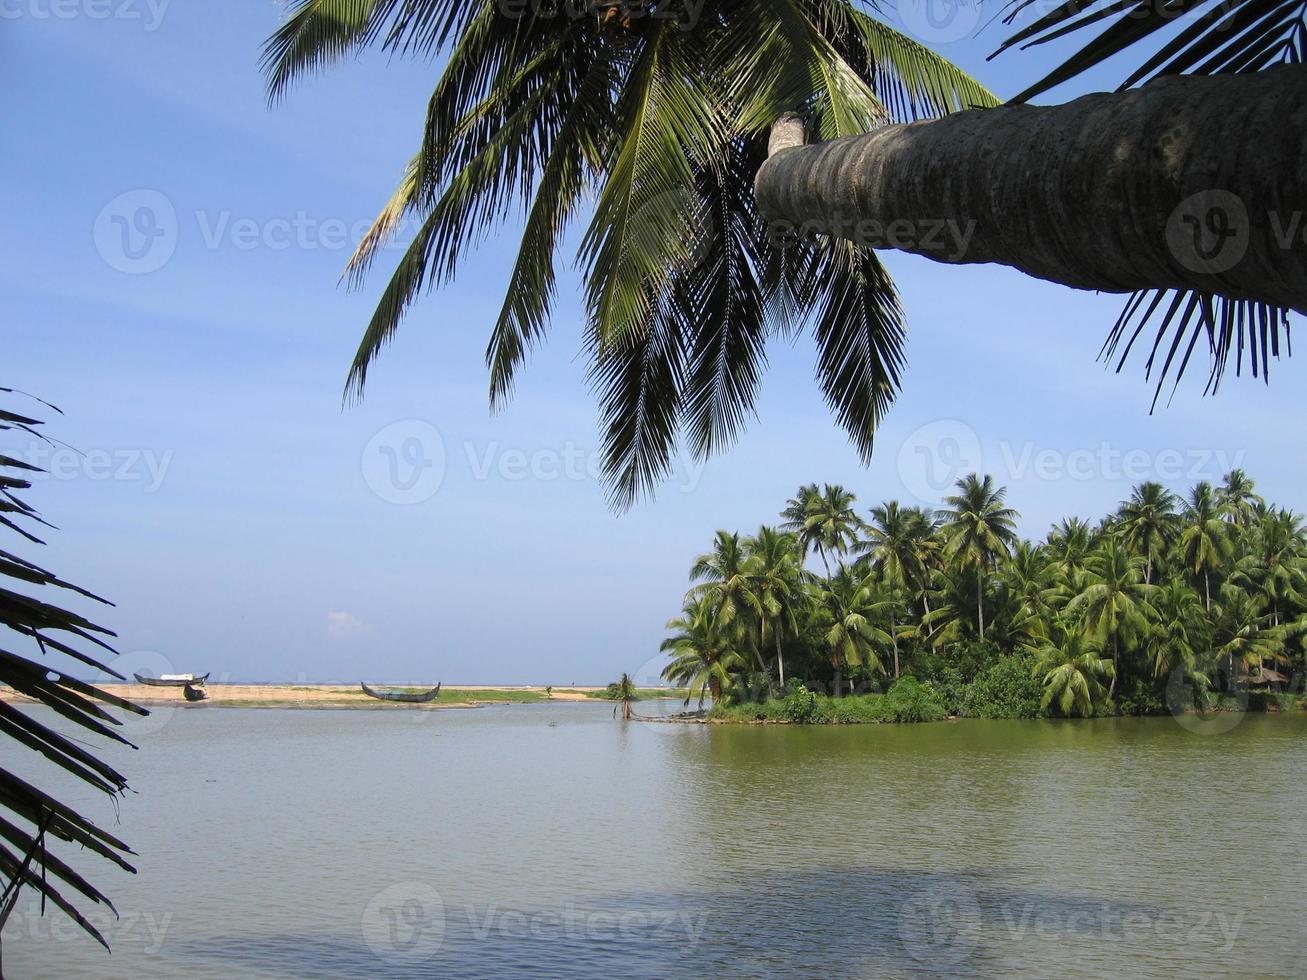 Kerala Backwaters und Kokospalmen foto